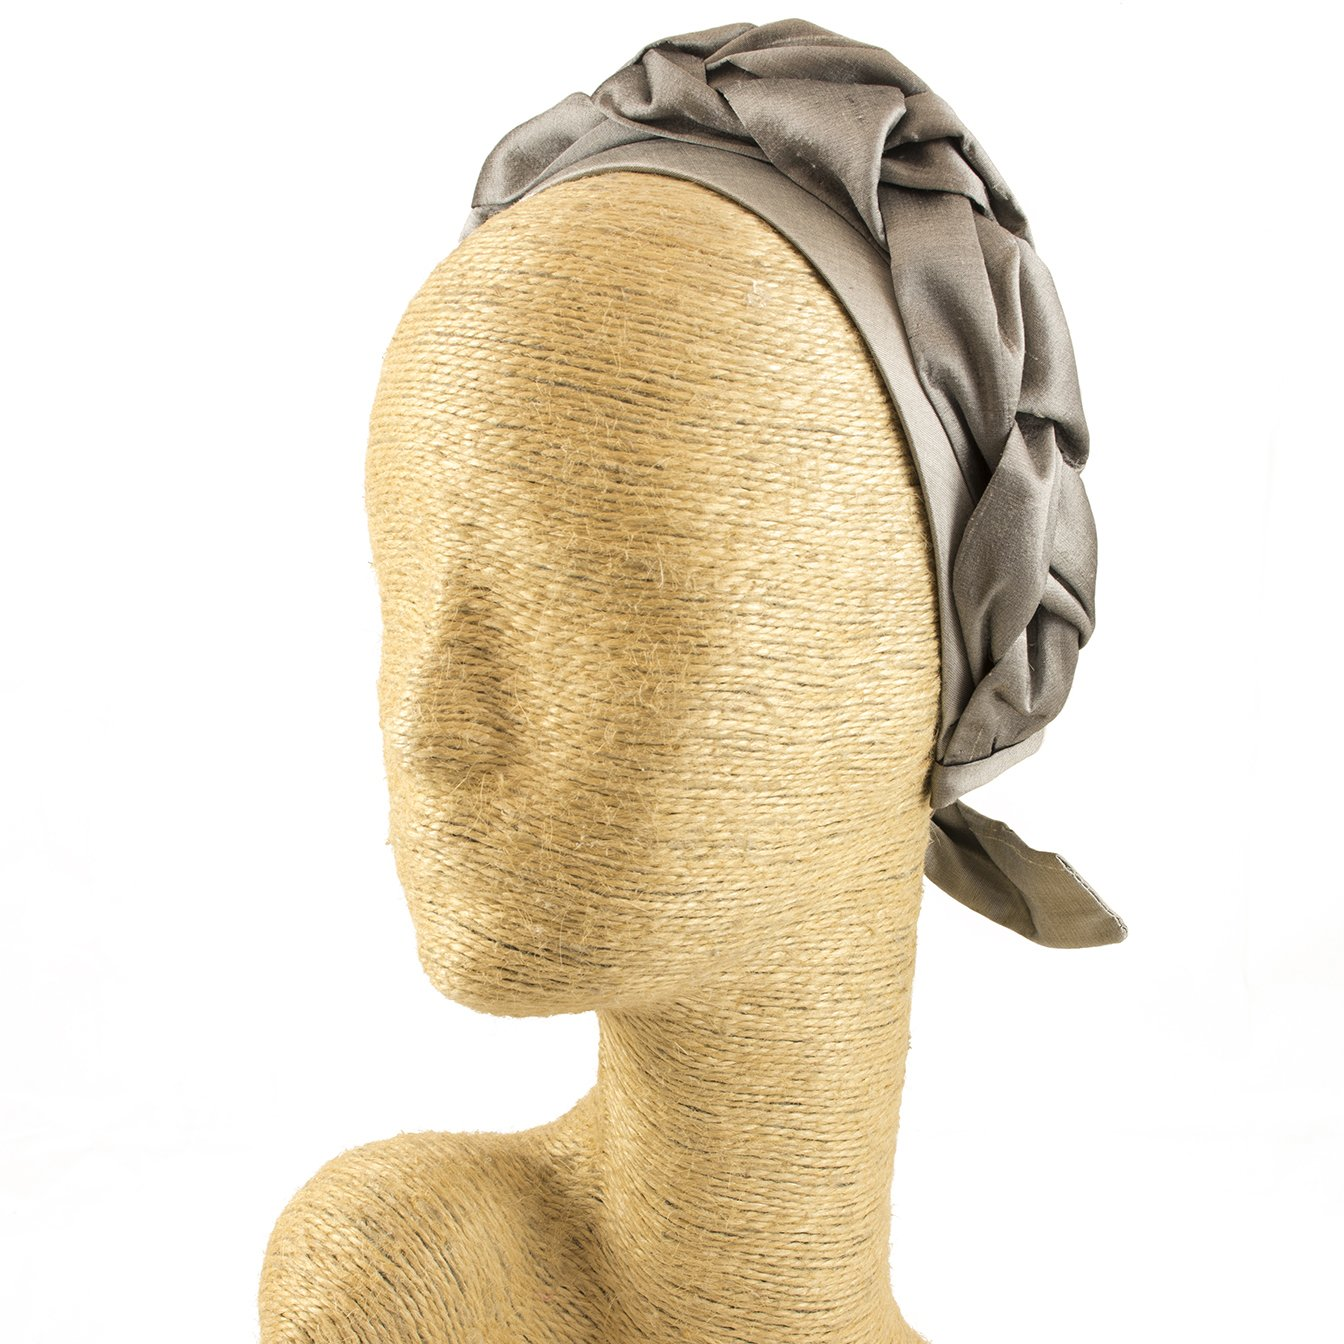 Silk Fascinator, Headdress, Headpiece, Occassion Hats, Royal Hats, Millinery, Worldwide Free Shipment, Delivery in 2 Days, Customized, Designer Fashion, Derby, Hair braid, Head wrap, Boho Chic, Beige